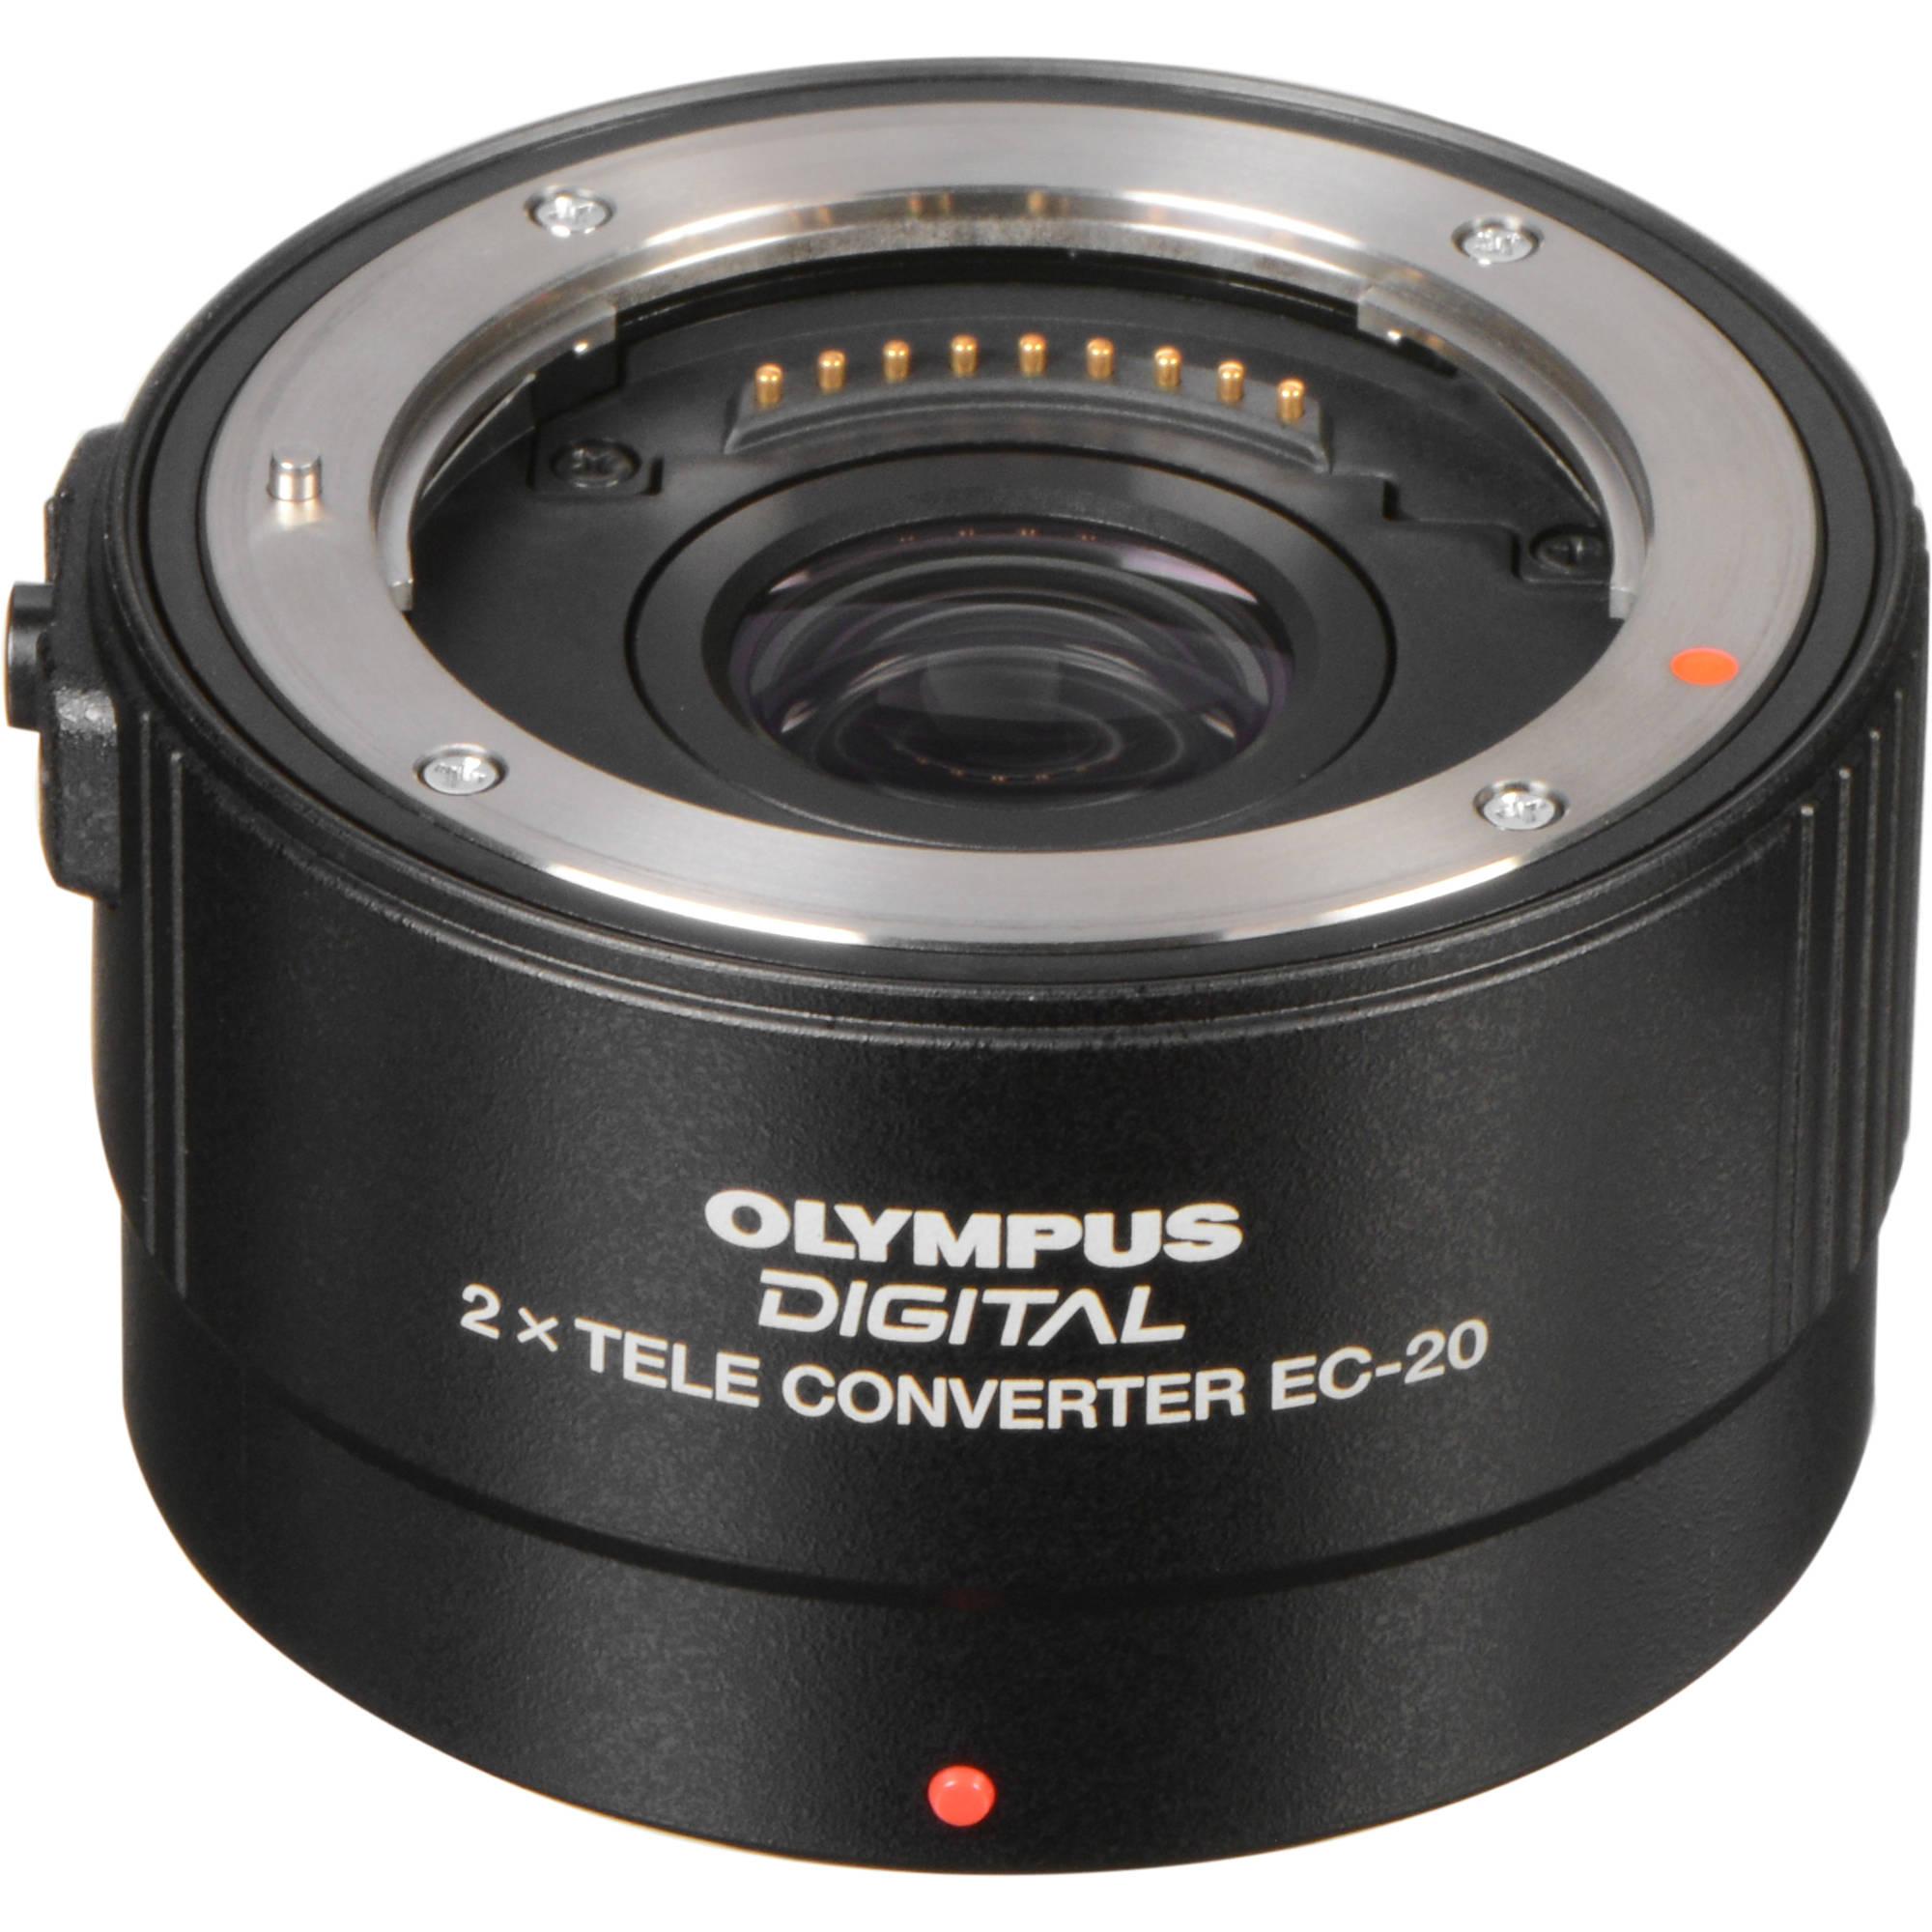 92 20 Tele Converter But I Finally Got A Chance To Borrow Both Olympus Mzuiko Digital Ed 40 150mm F 28 Pro Mc 14 14x Teleconverter For M Zuiko 150 Mm Lens Ec 20x